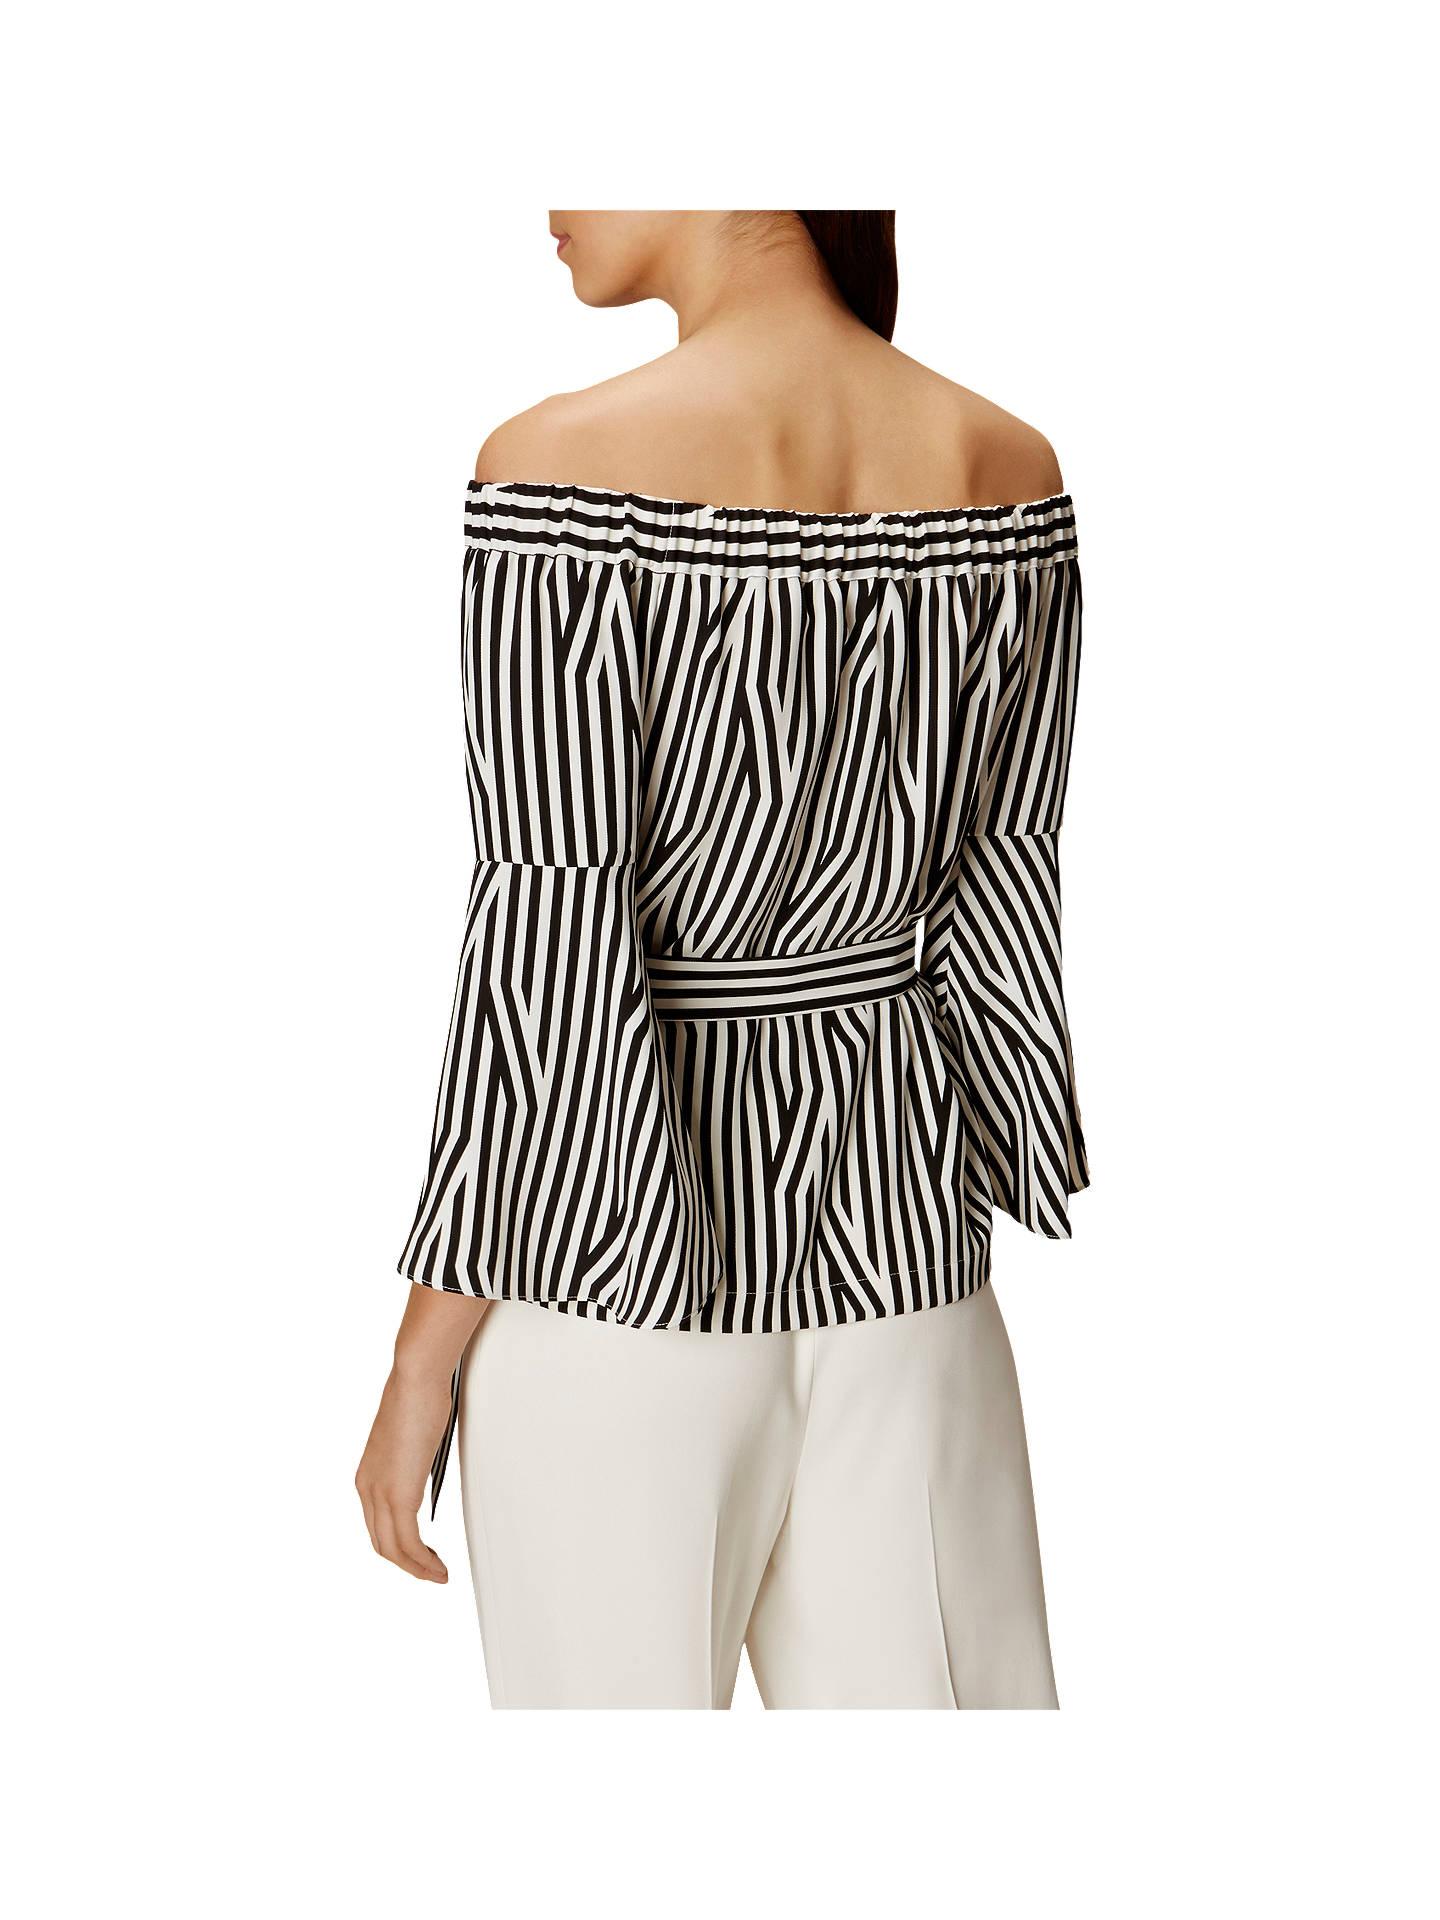 fb2ed72e0e16aa Buy Karen Millen Striped Bardot Top, Black/White, 6 Online at johnlewis.